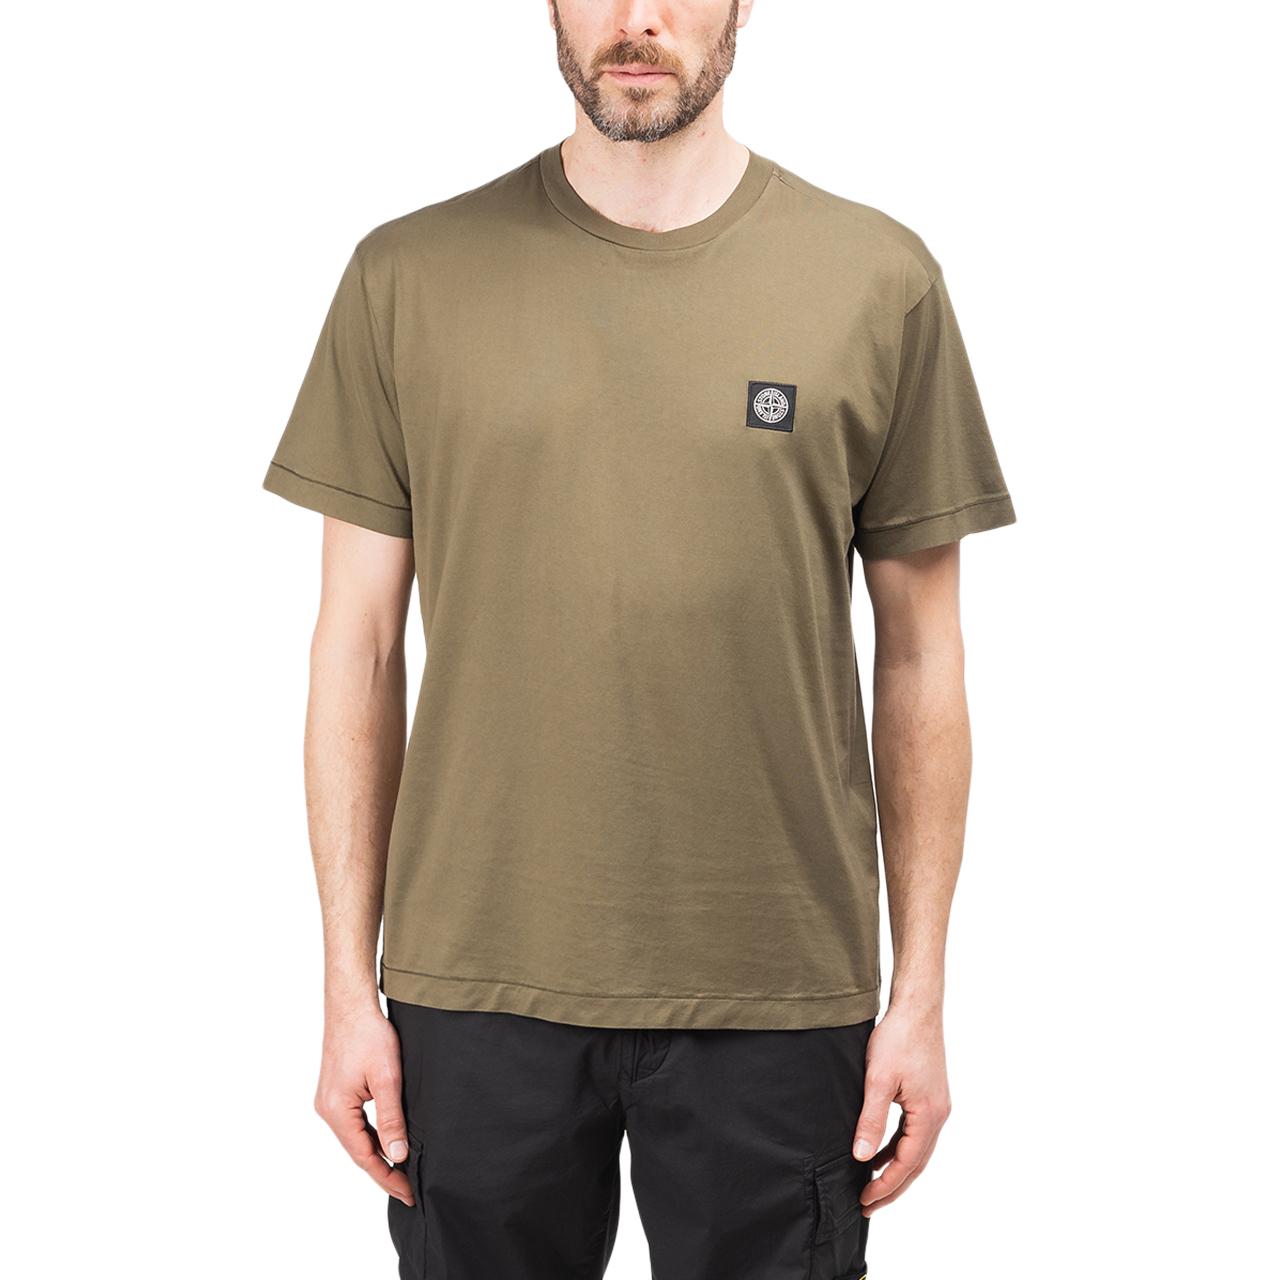 Stone Island T-Shirt (Khaki)